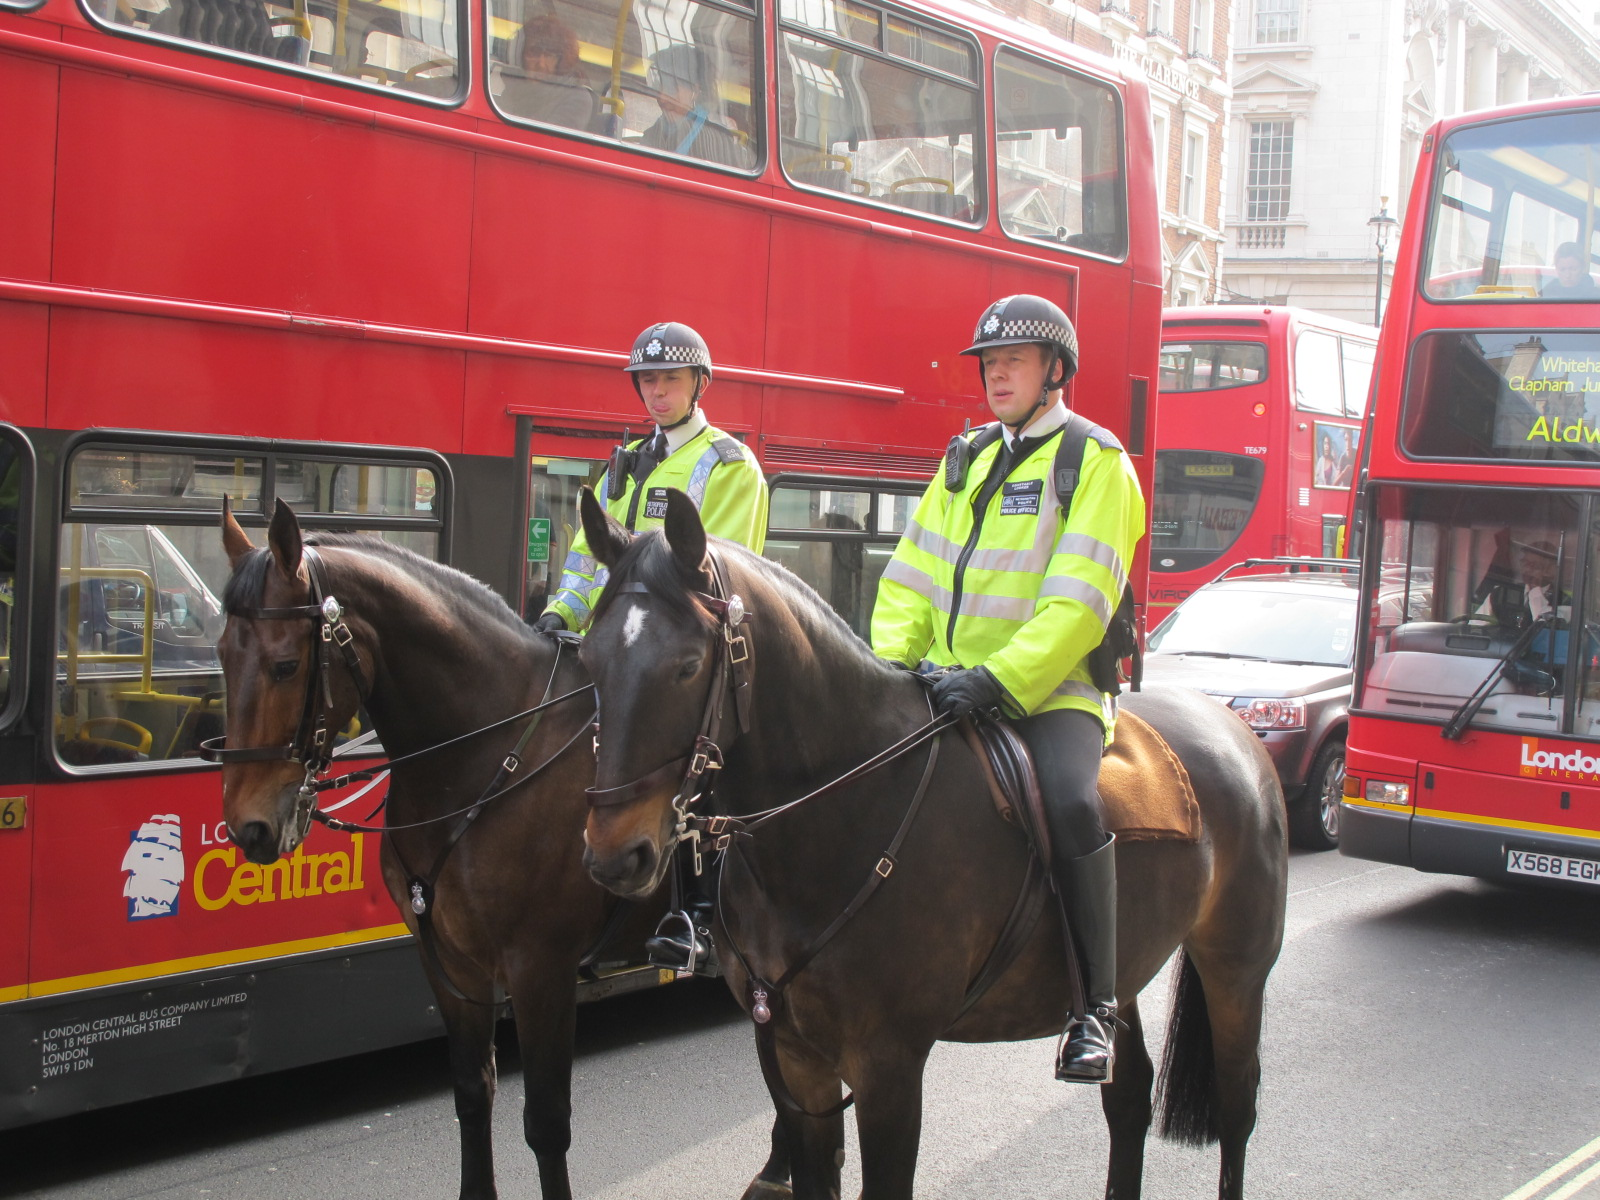 London-2012-longon-police-on-horse